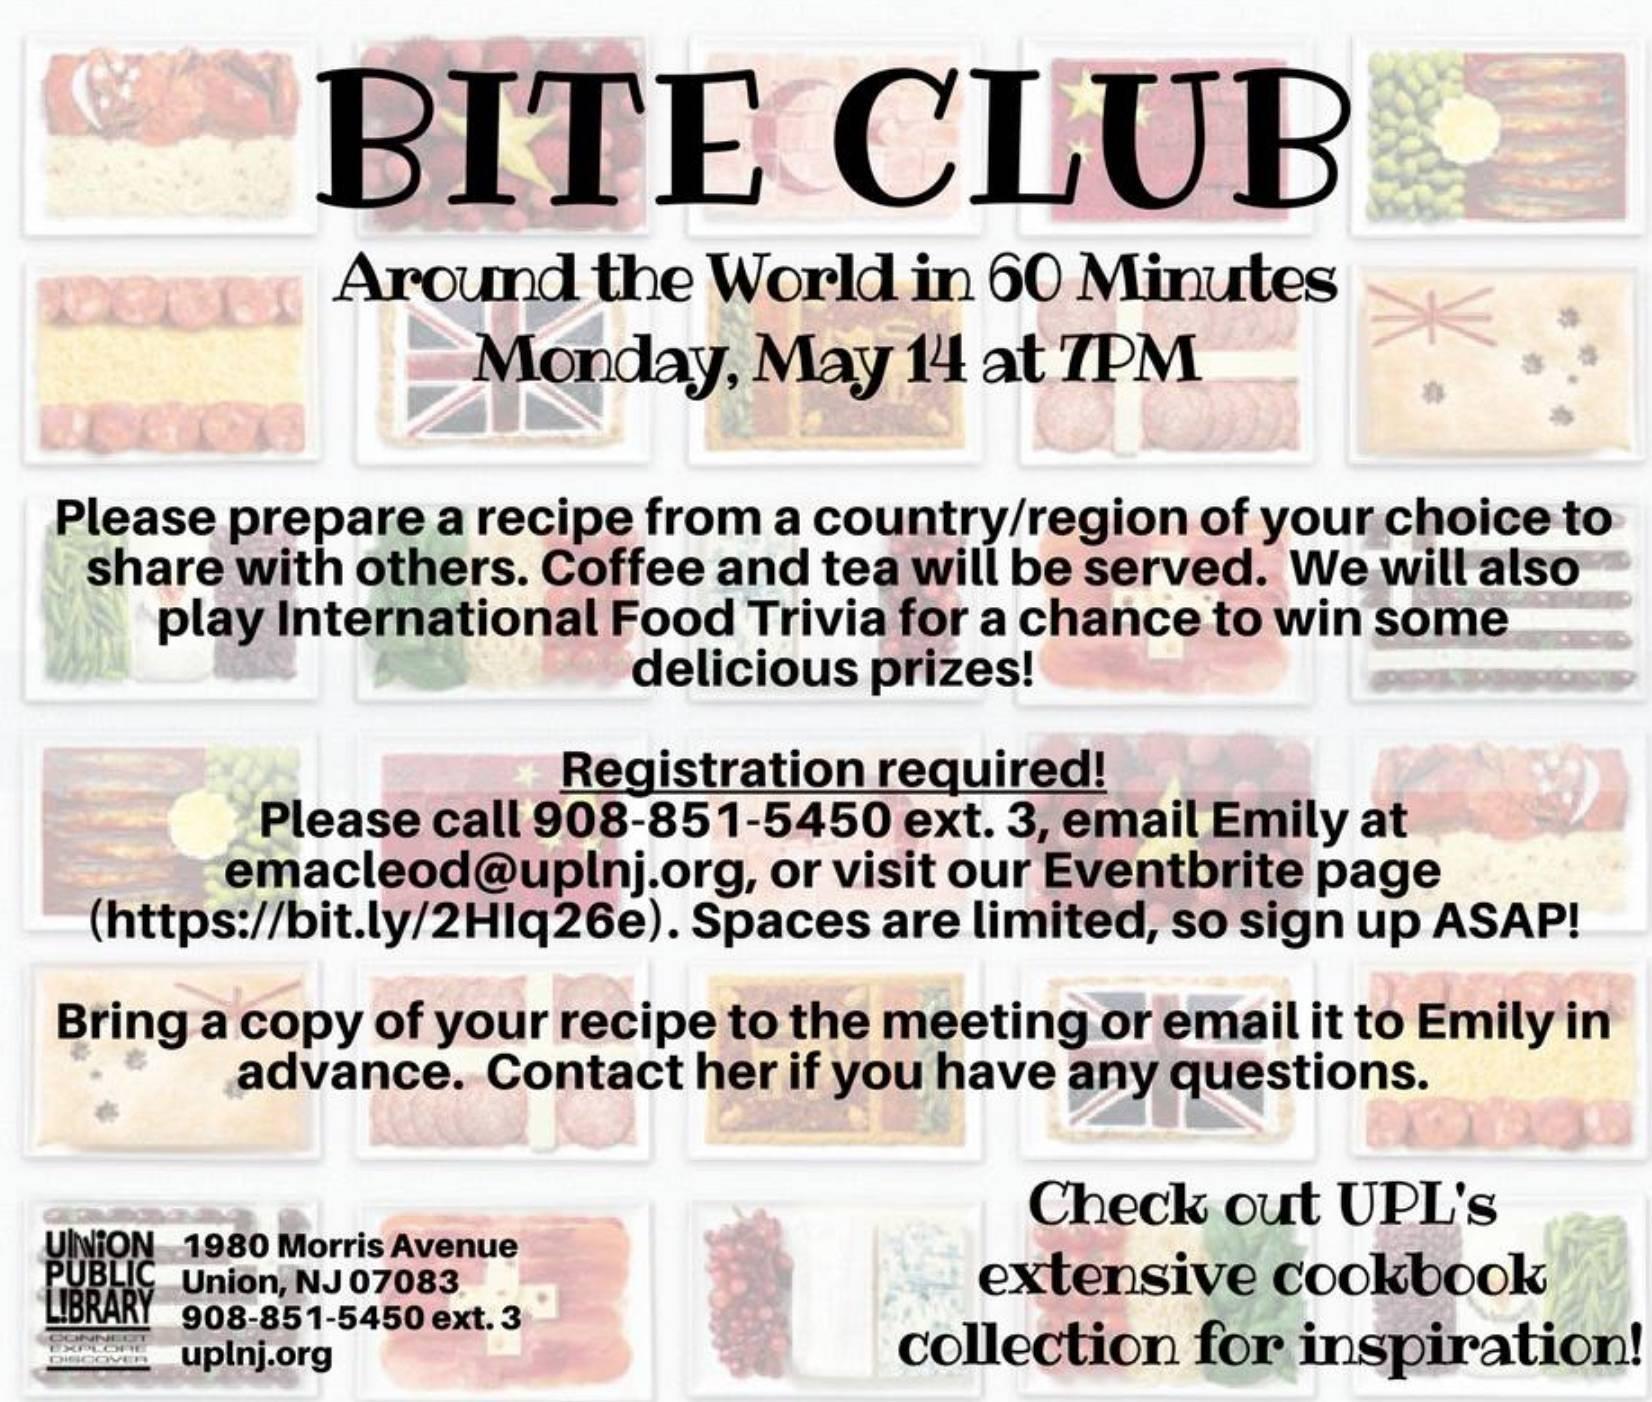 a107e93be59a2e844611_6e75aa928234742e7b69_bite_club_around_the_world.jpg